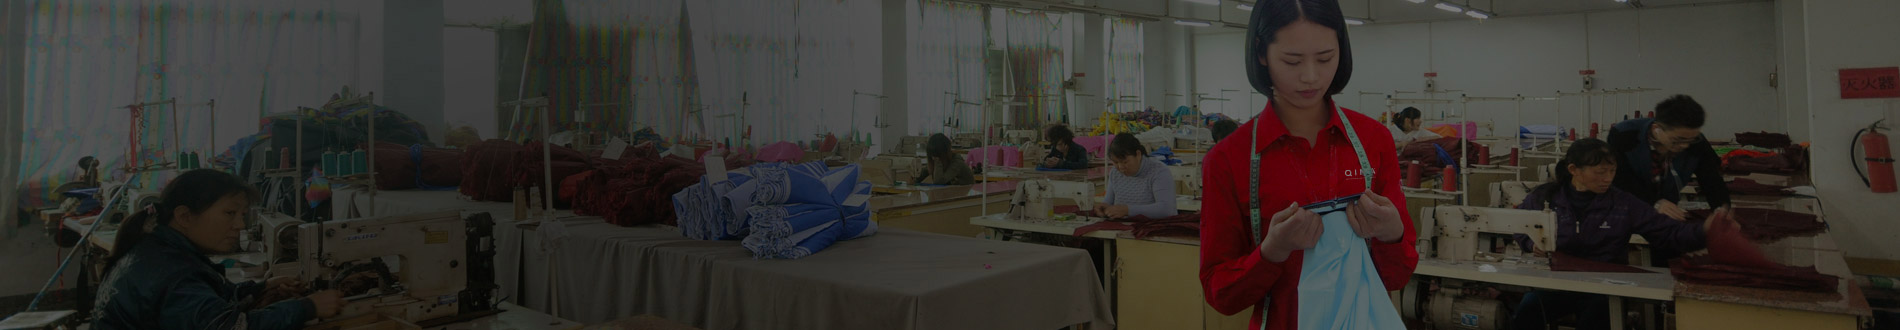 Softlines – Textile Testing & Quality Control | QIMA